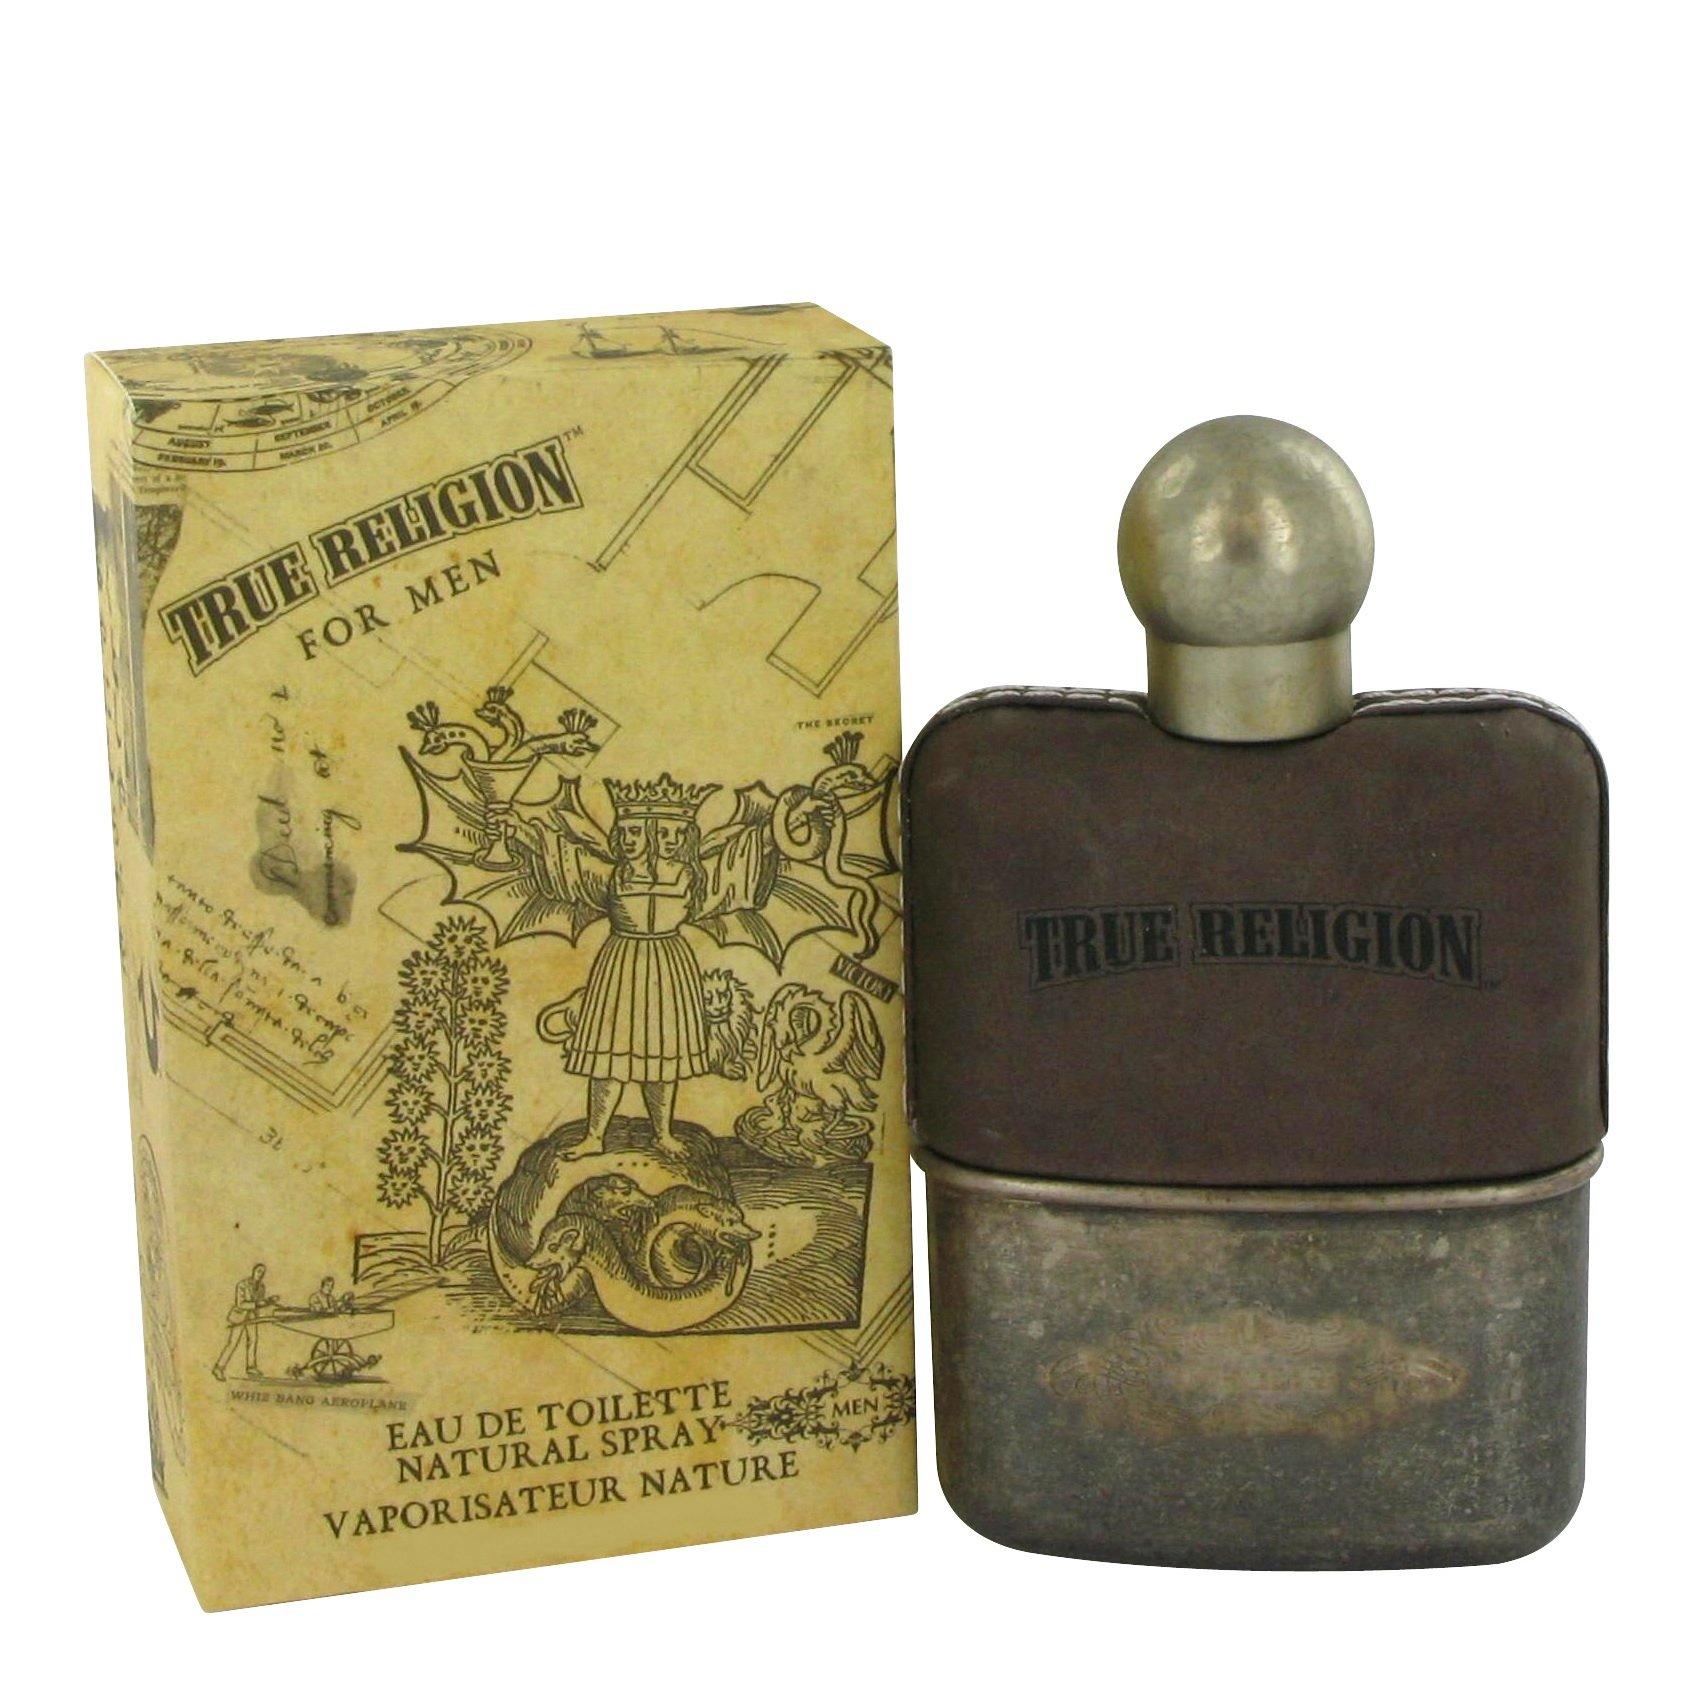 True Religion Eau De Toilette Spray for Men, 1.7 Ounce